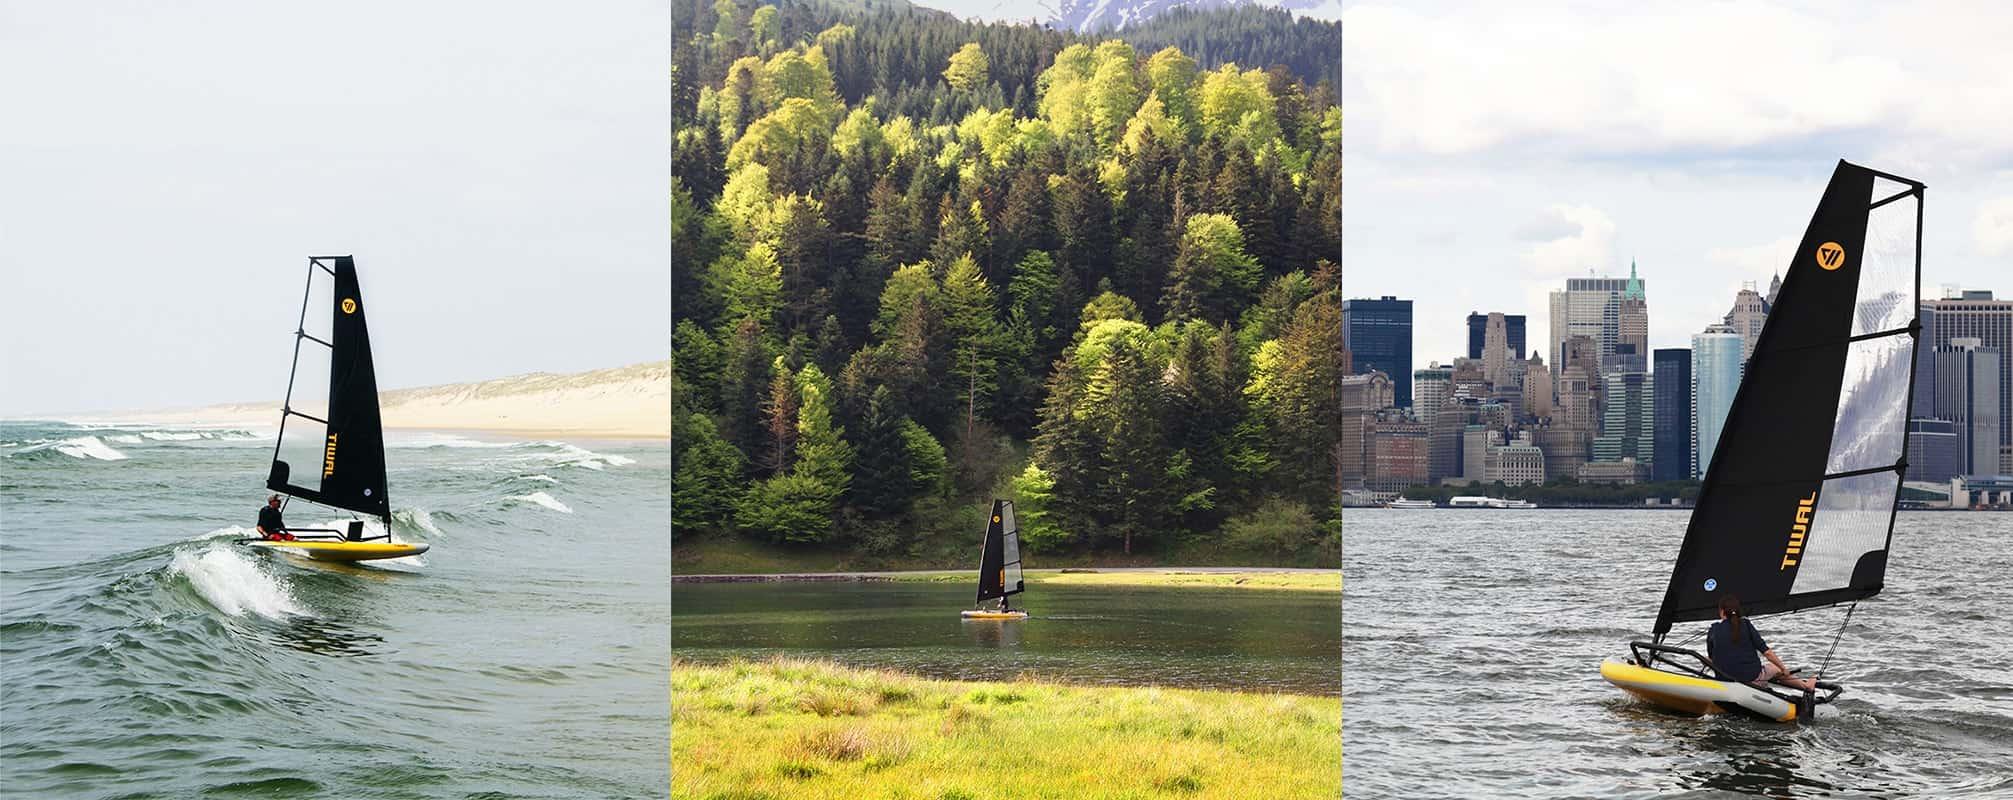 navigation deriveur tiwal mer lac ville